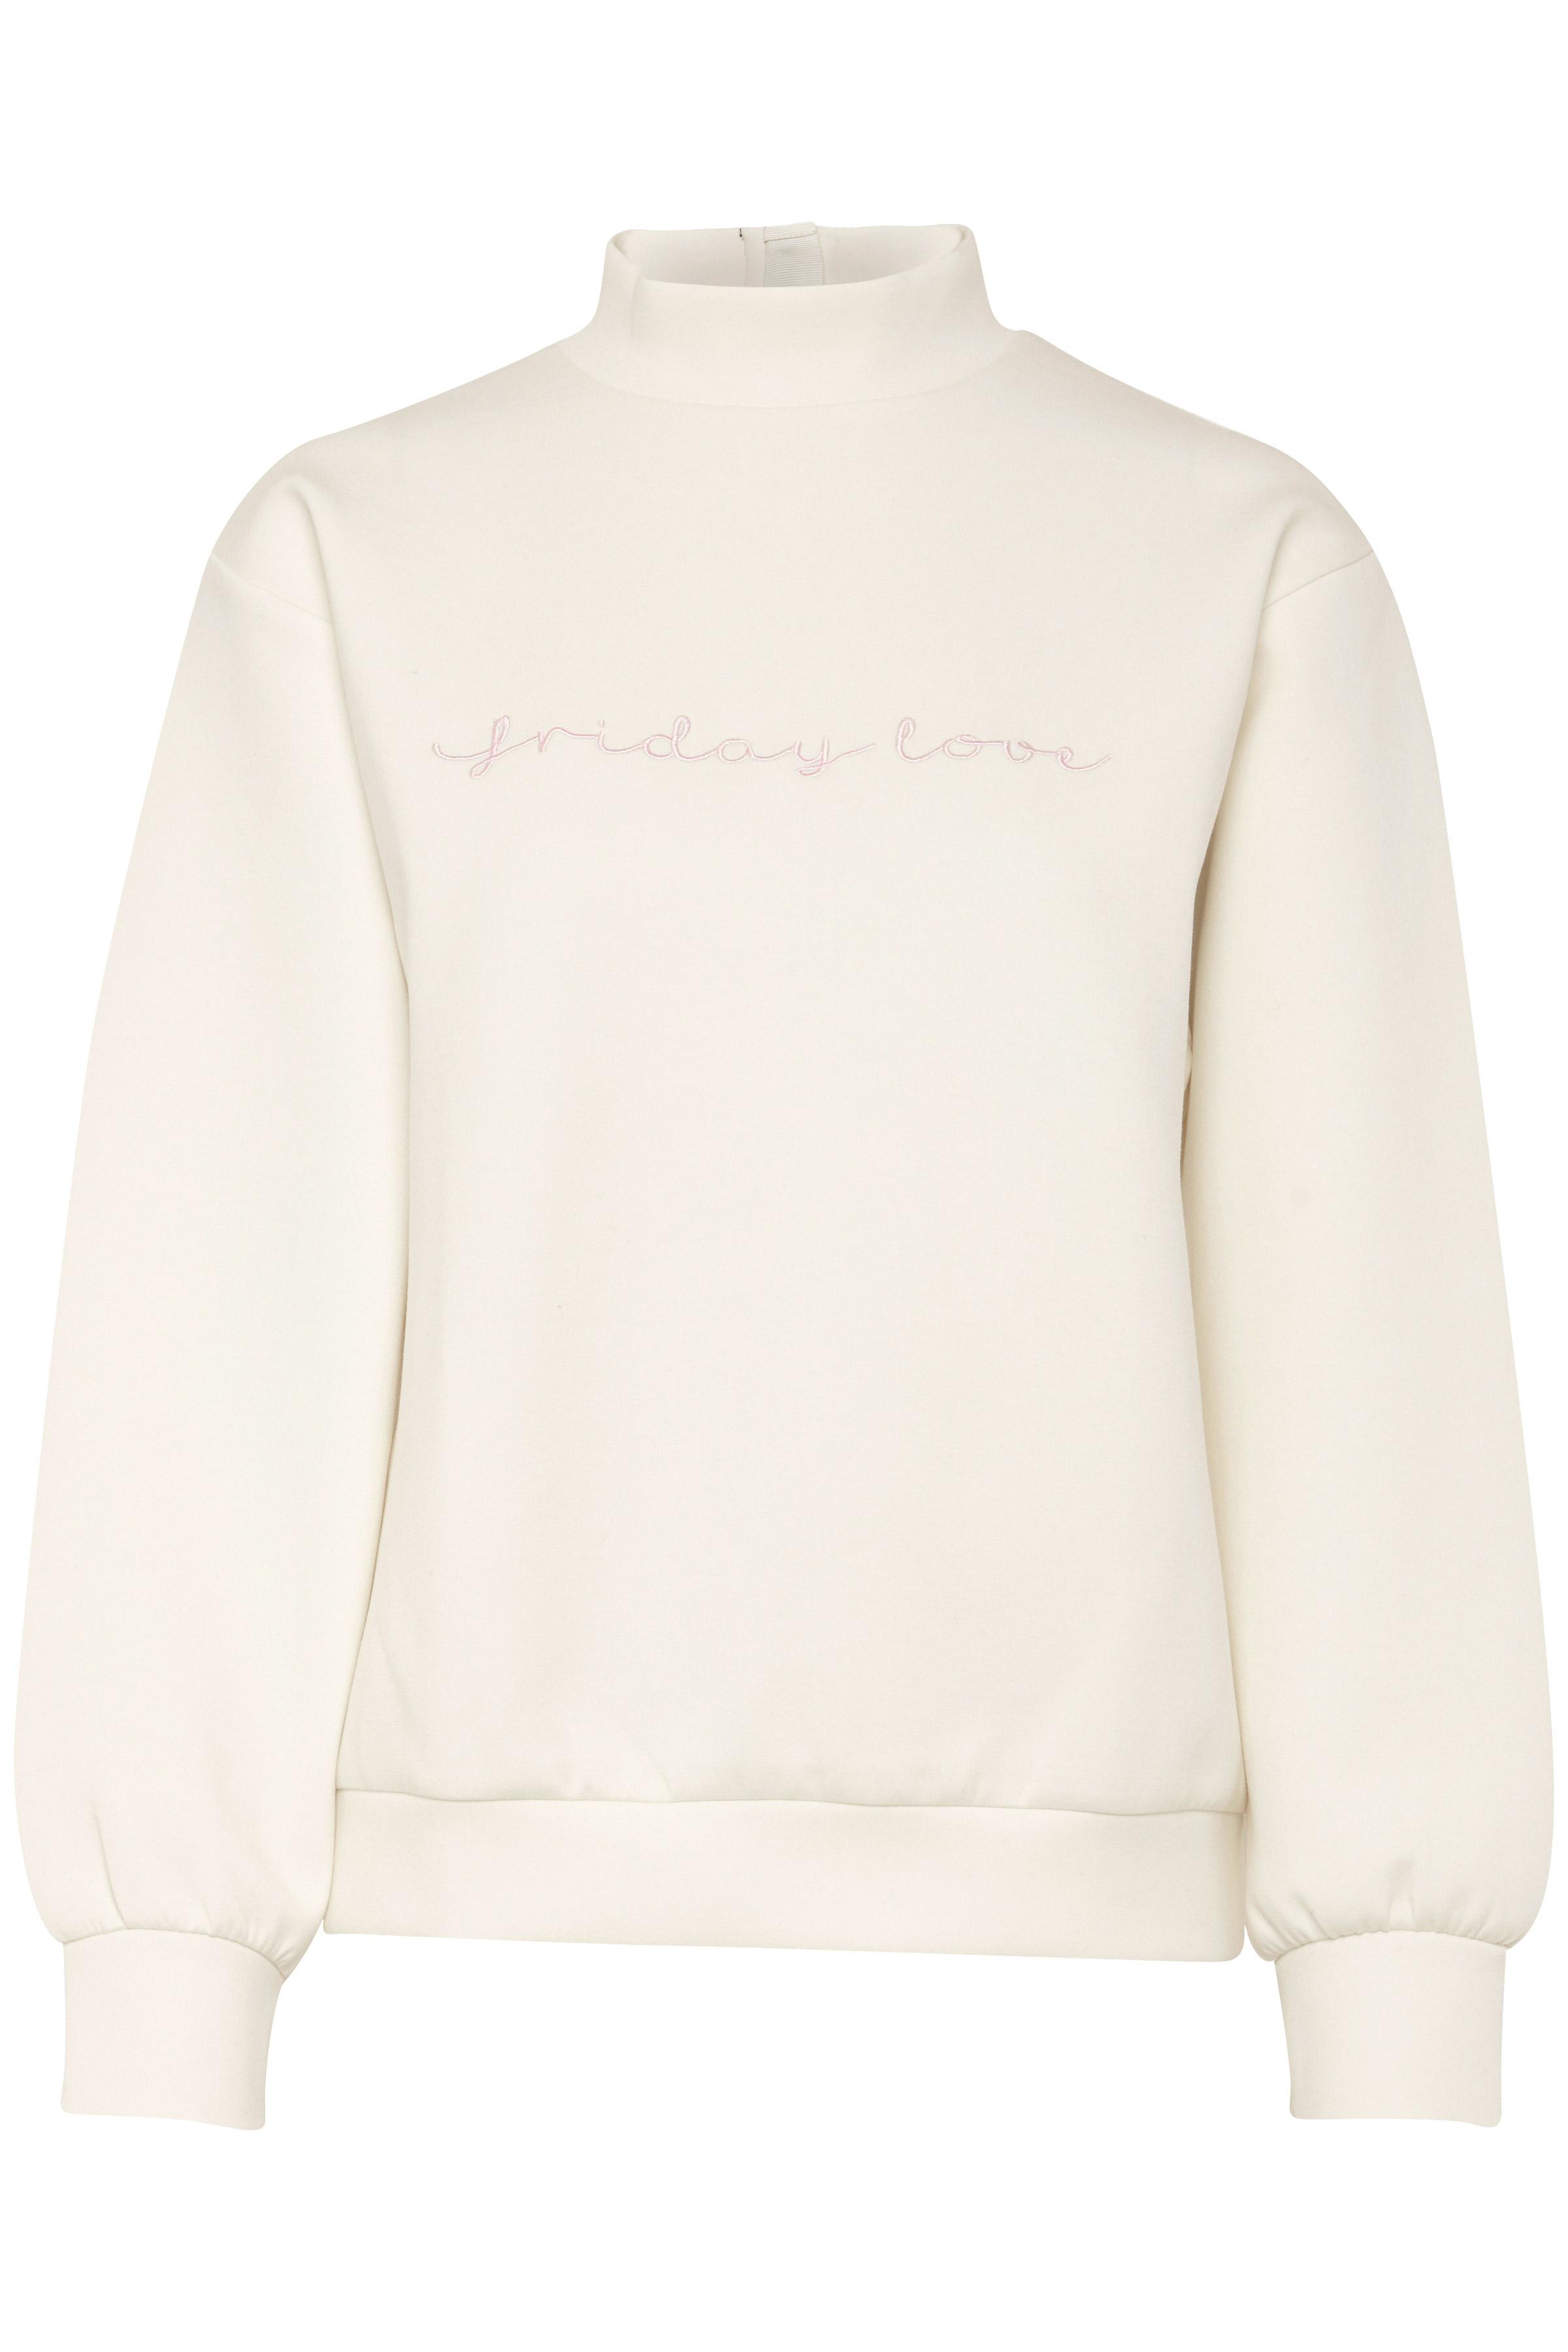 Off-white Sweatshirt fra b.young – Køb Off-white Sweatshirt fra str. XS-XXL her